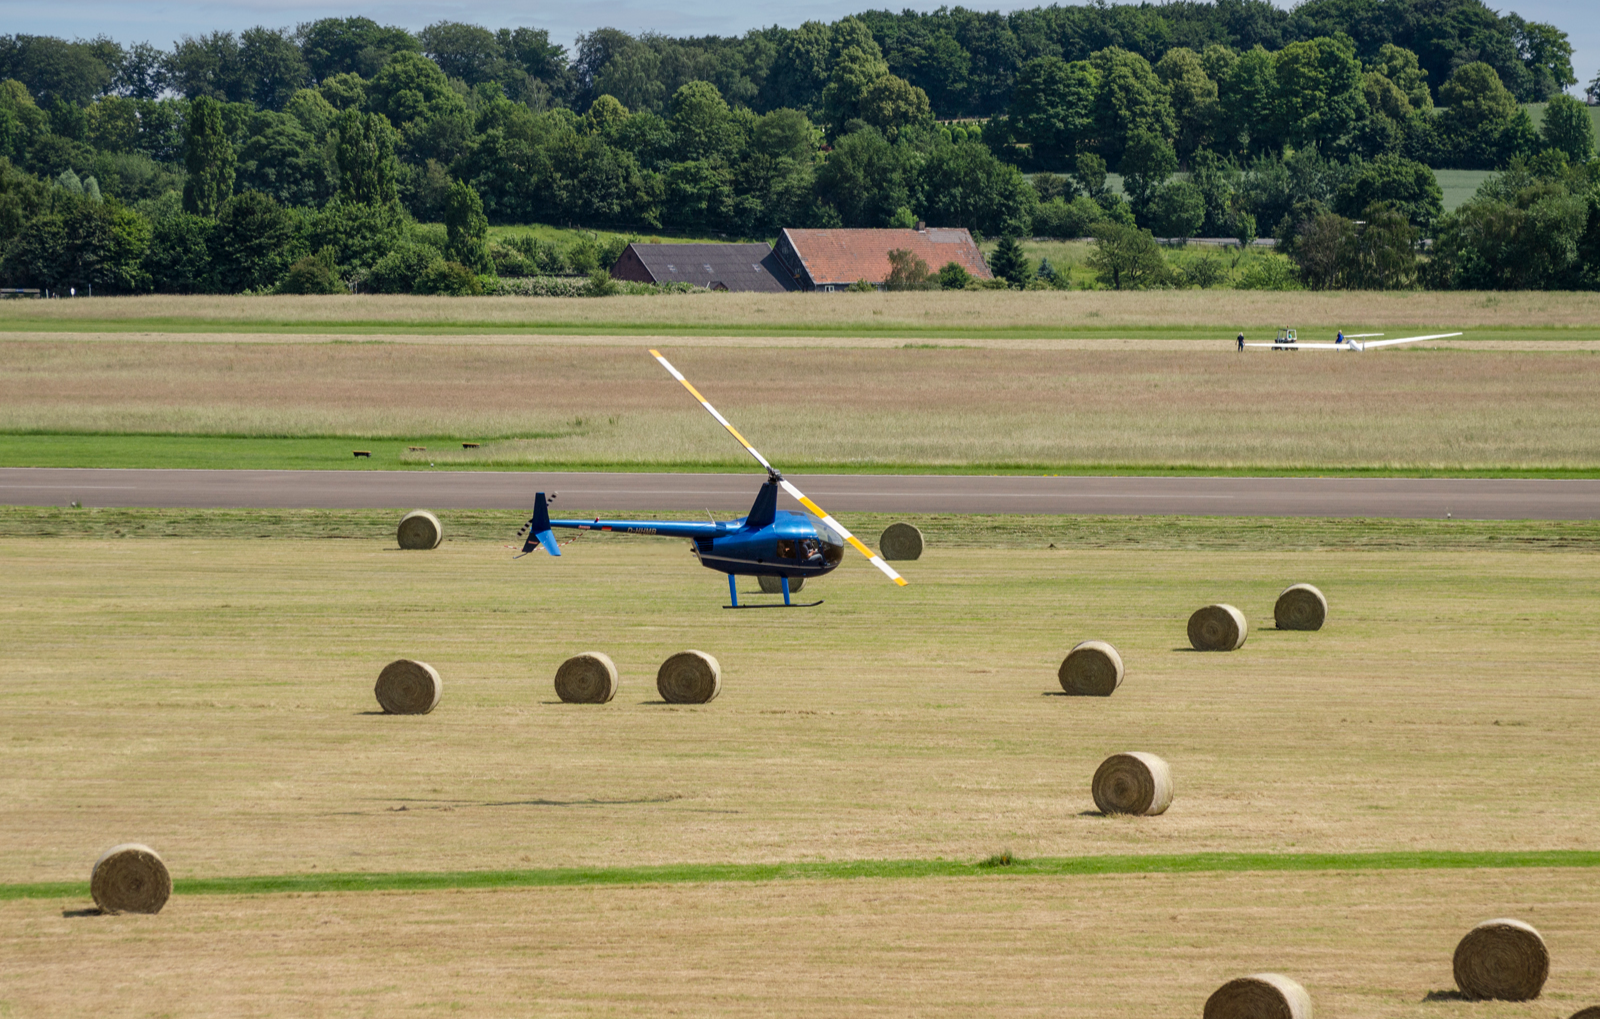 hubschrauber-fliegen-grosspoesna-bg3